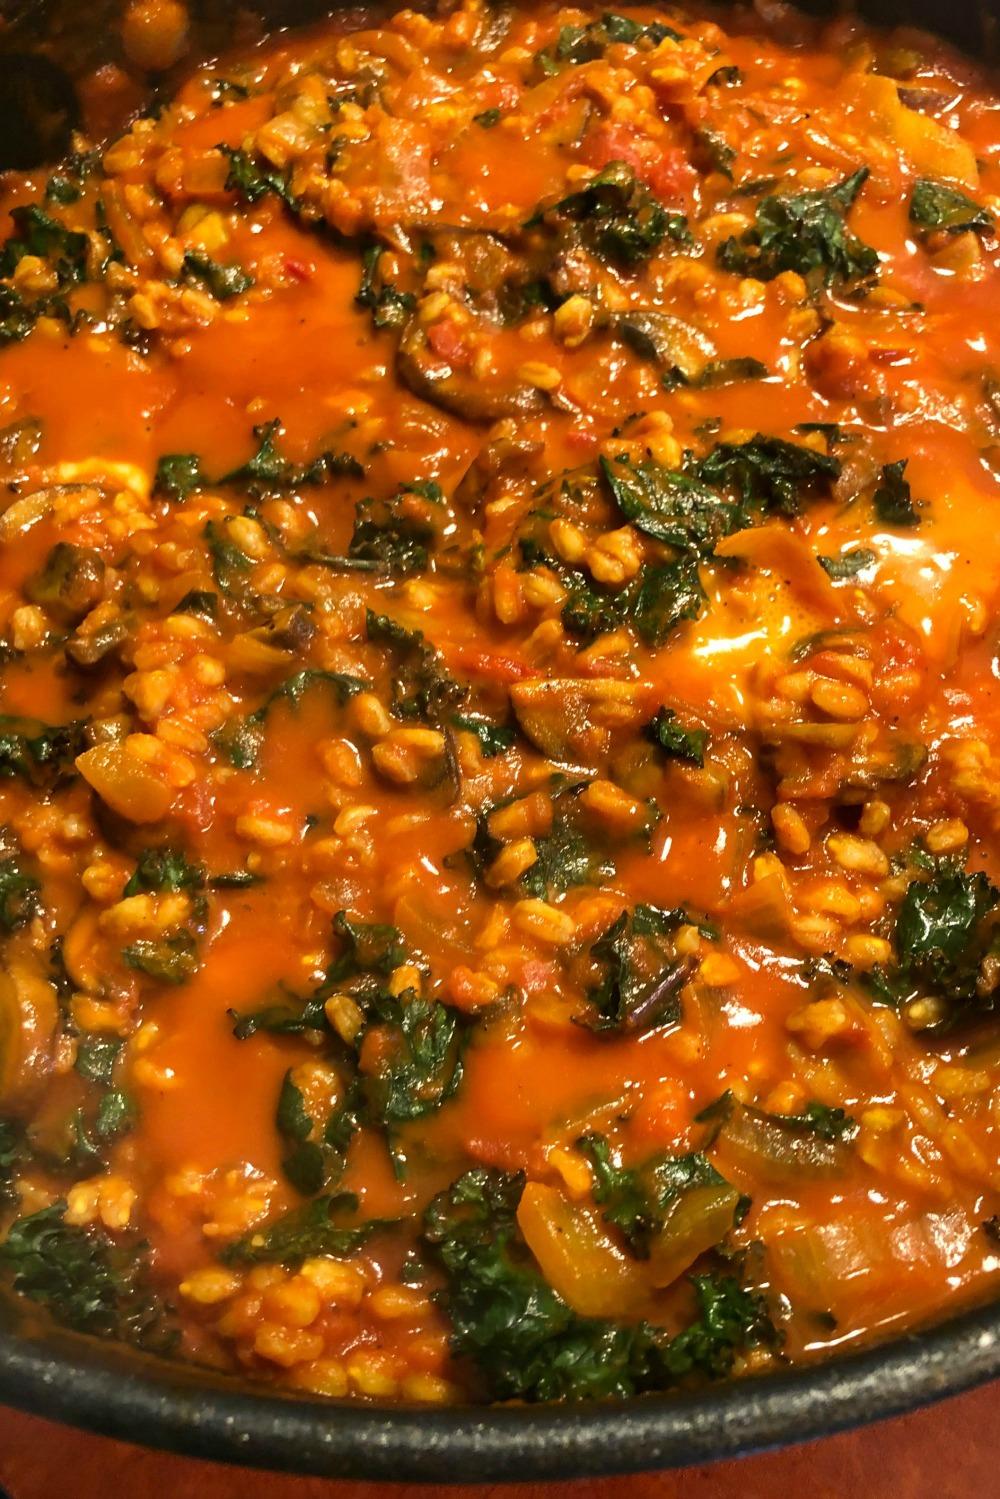 An Easy Farro Risotta Recipe That's Perfect for Weeknights I Vegan Dinner Ideas #veganrecipes #easyrecipes #weeknightrecipe